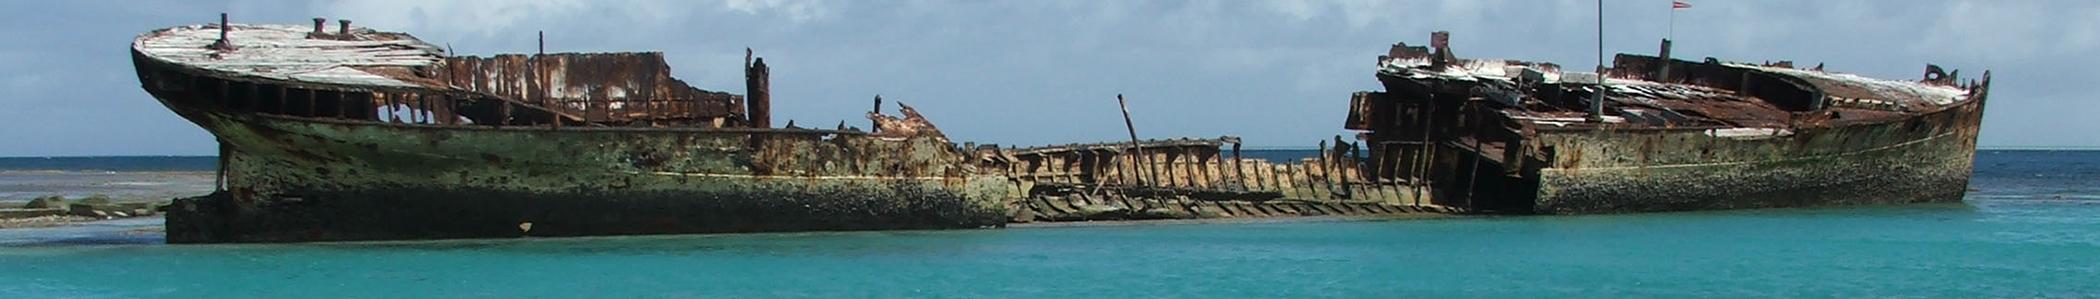 Heron Island Resort Accommodation